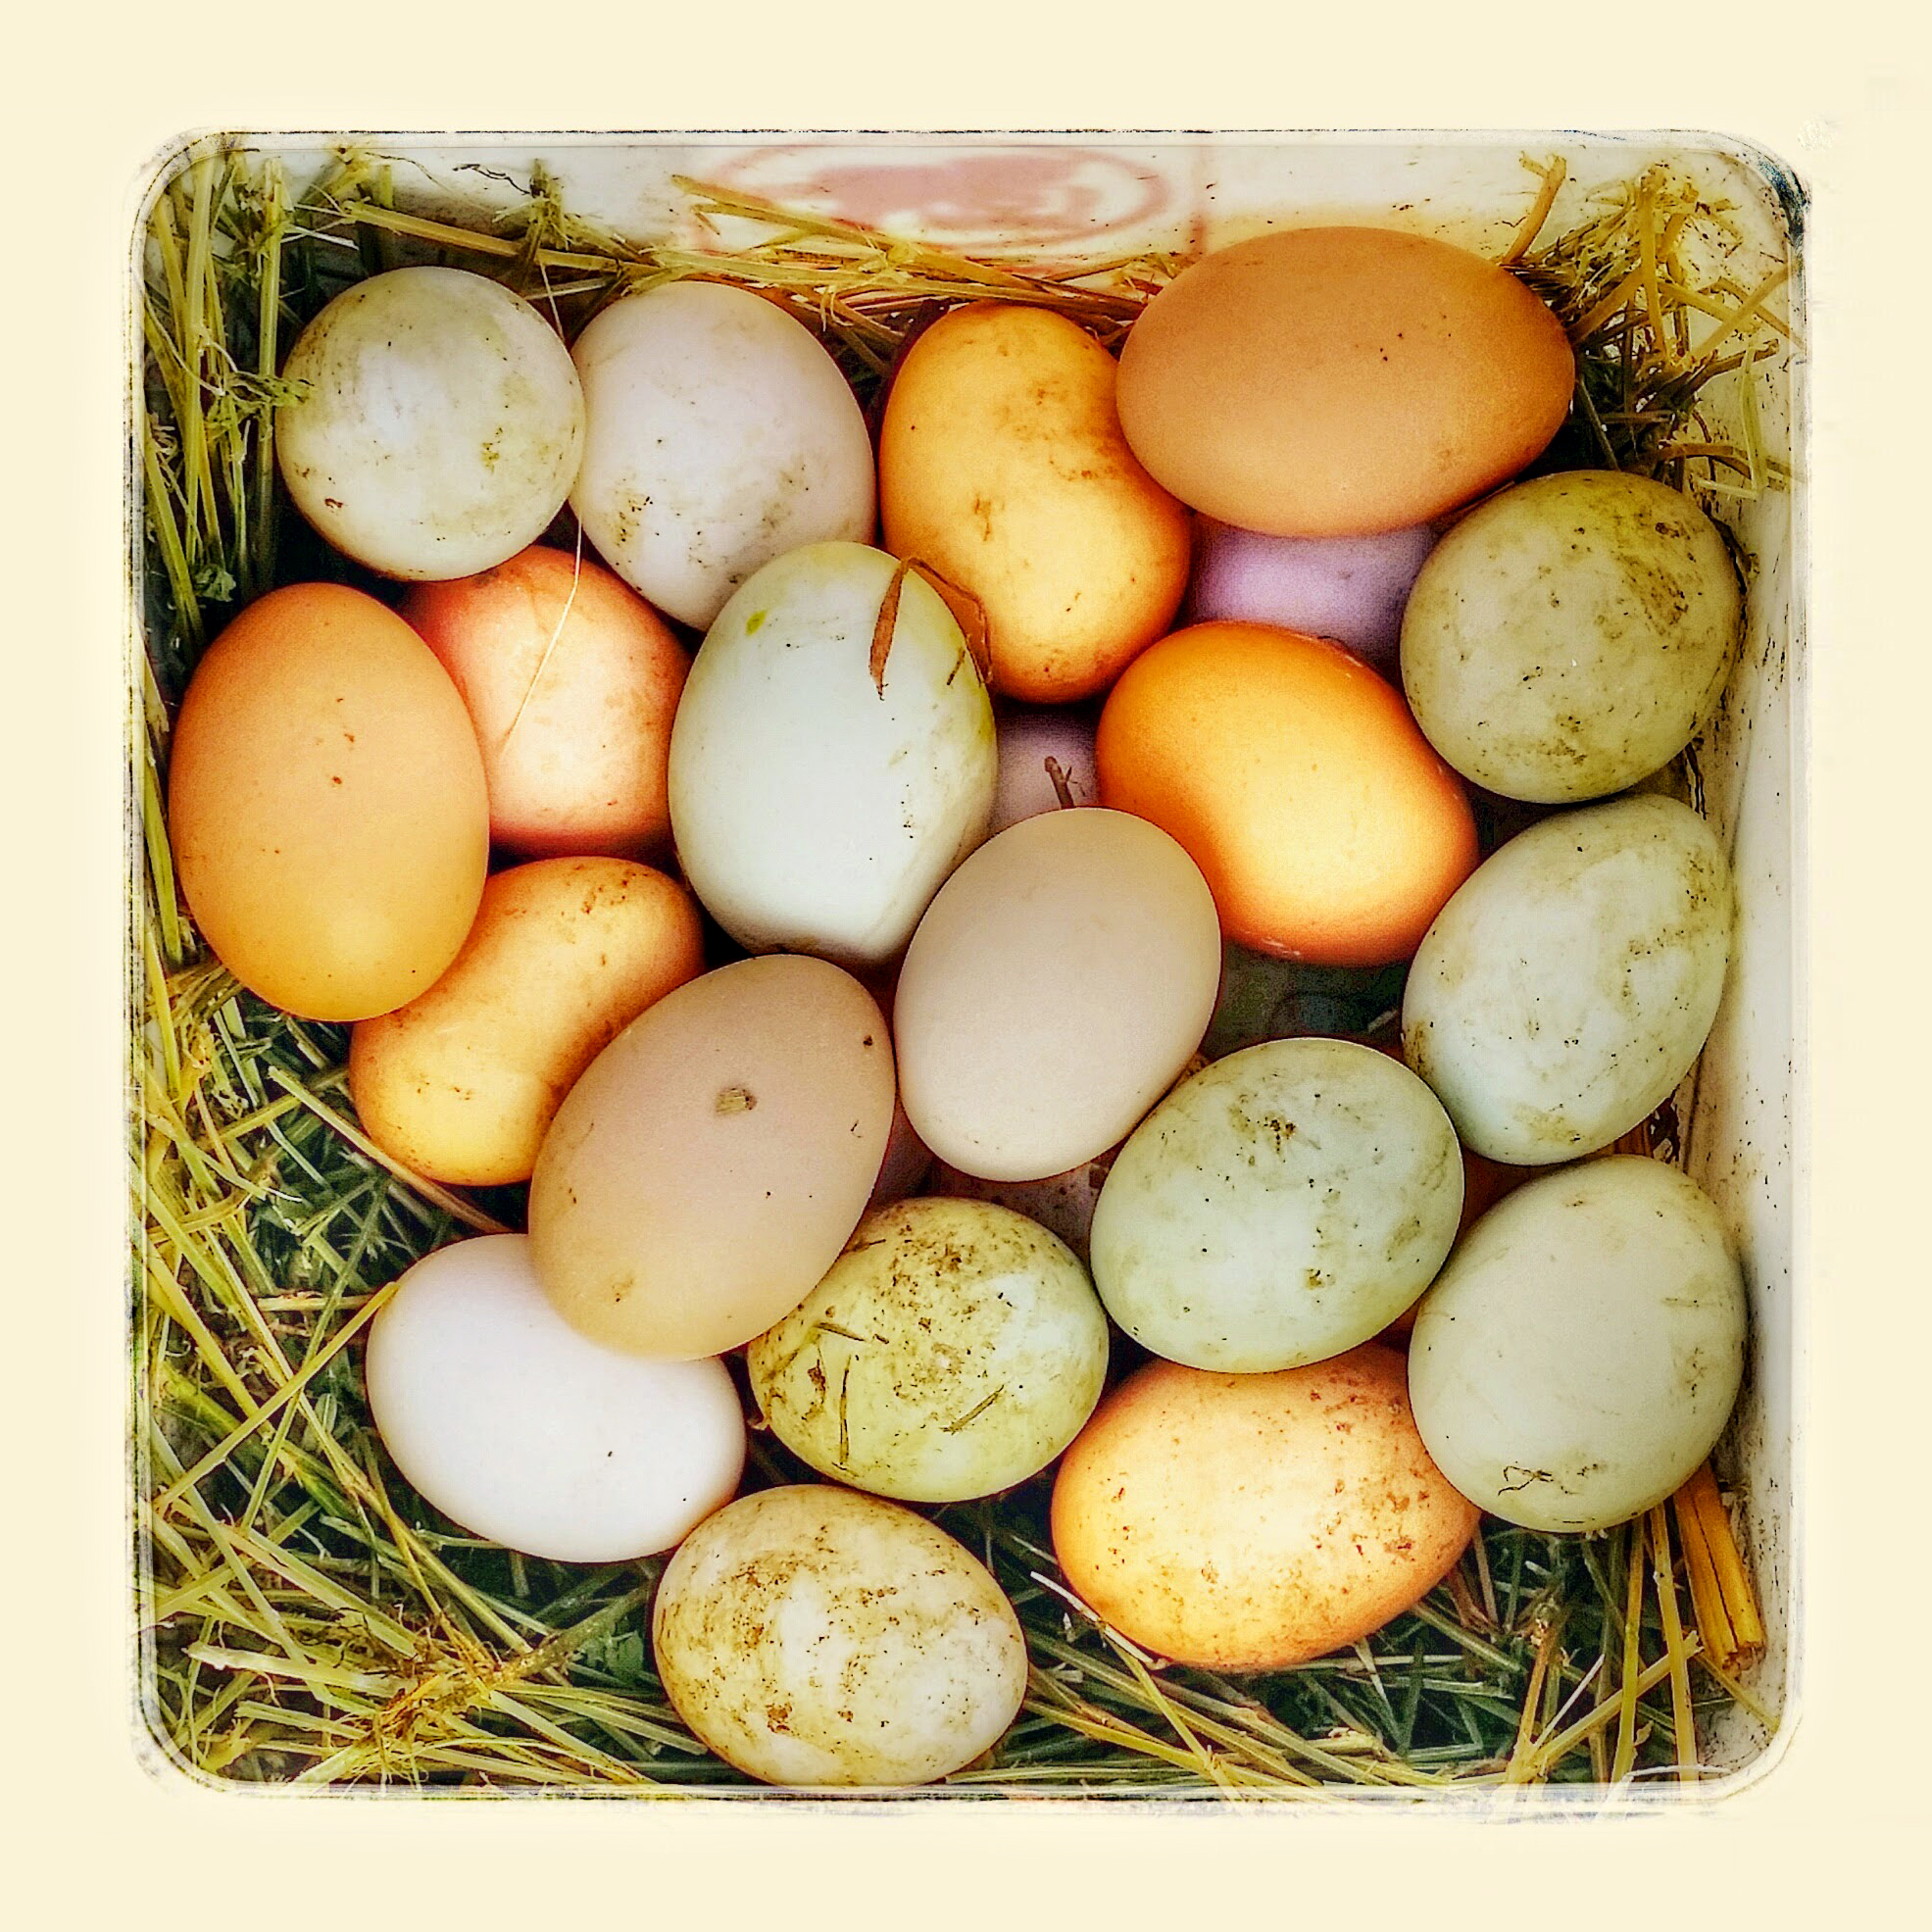 eggs_after.jpg